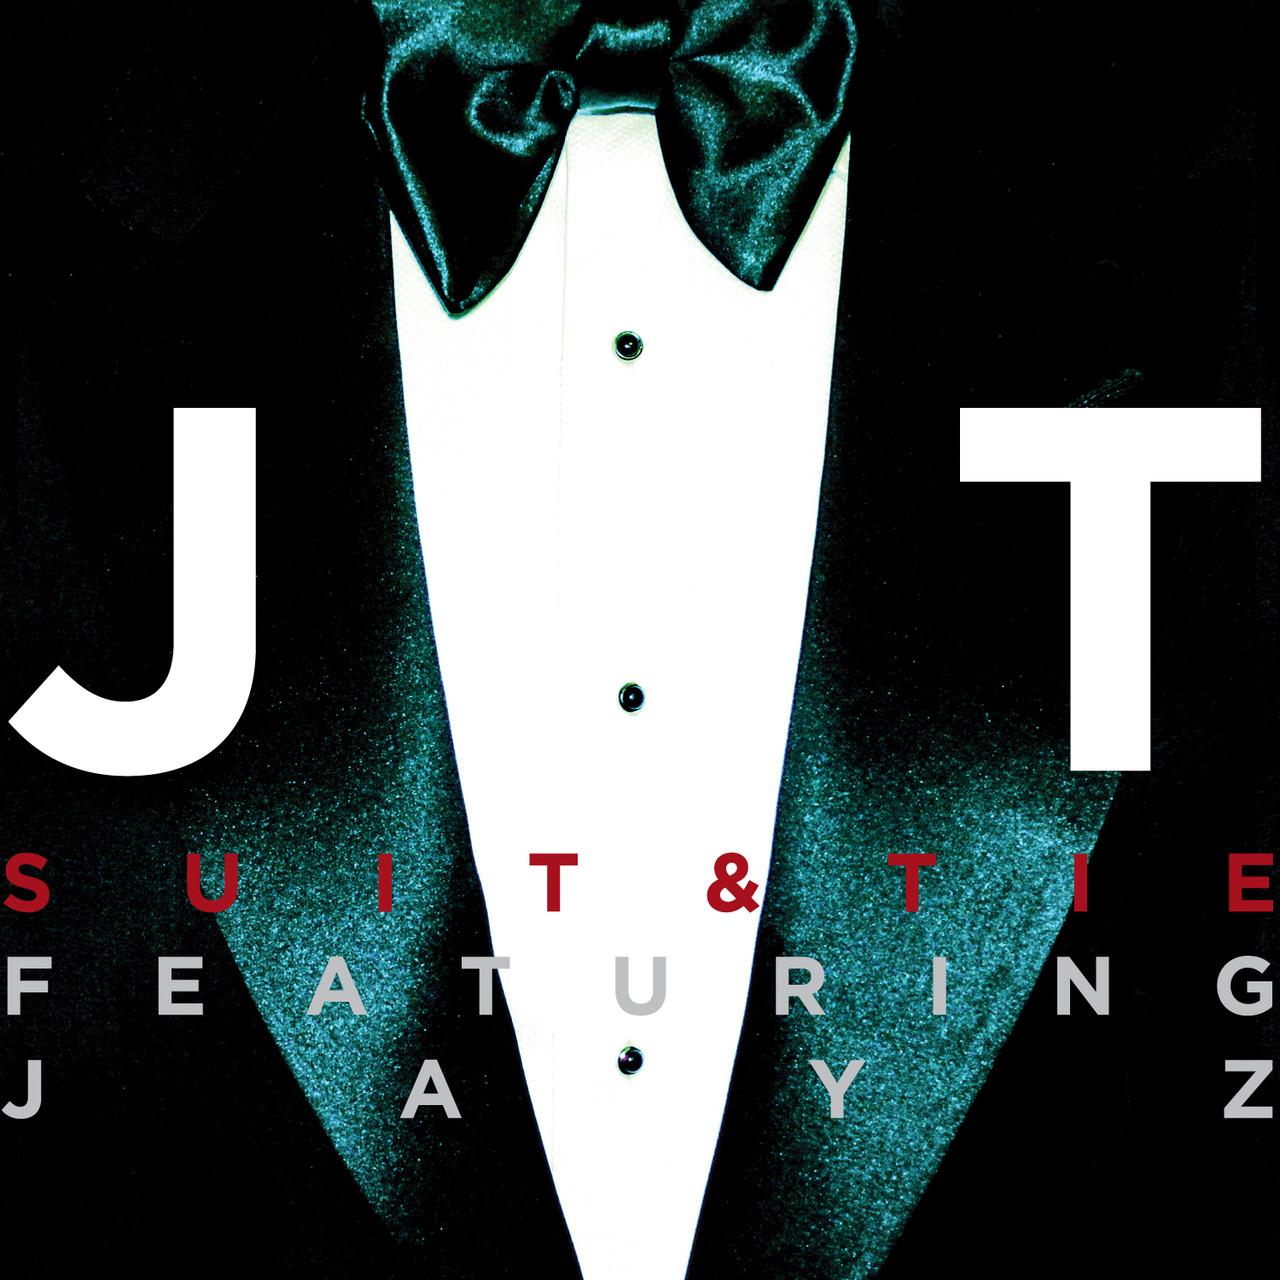 http://3.bp.blogspot.com/-gFwcKlXm_Iw/UPYaliehseI/AAAAAAAAD5Q/5fcmDC7wbns/s1600/Justin+Timberlake+Jay-Z+Suit+%2526+Tie.jpg